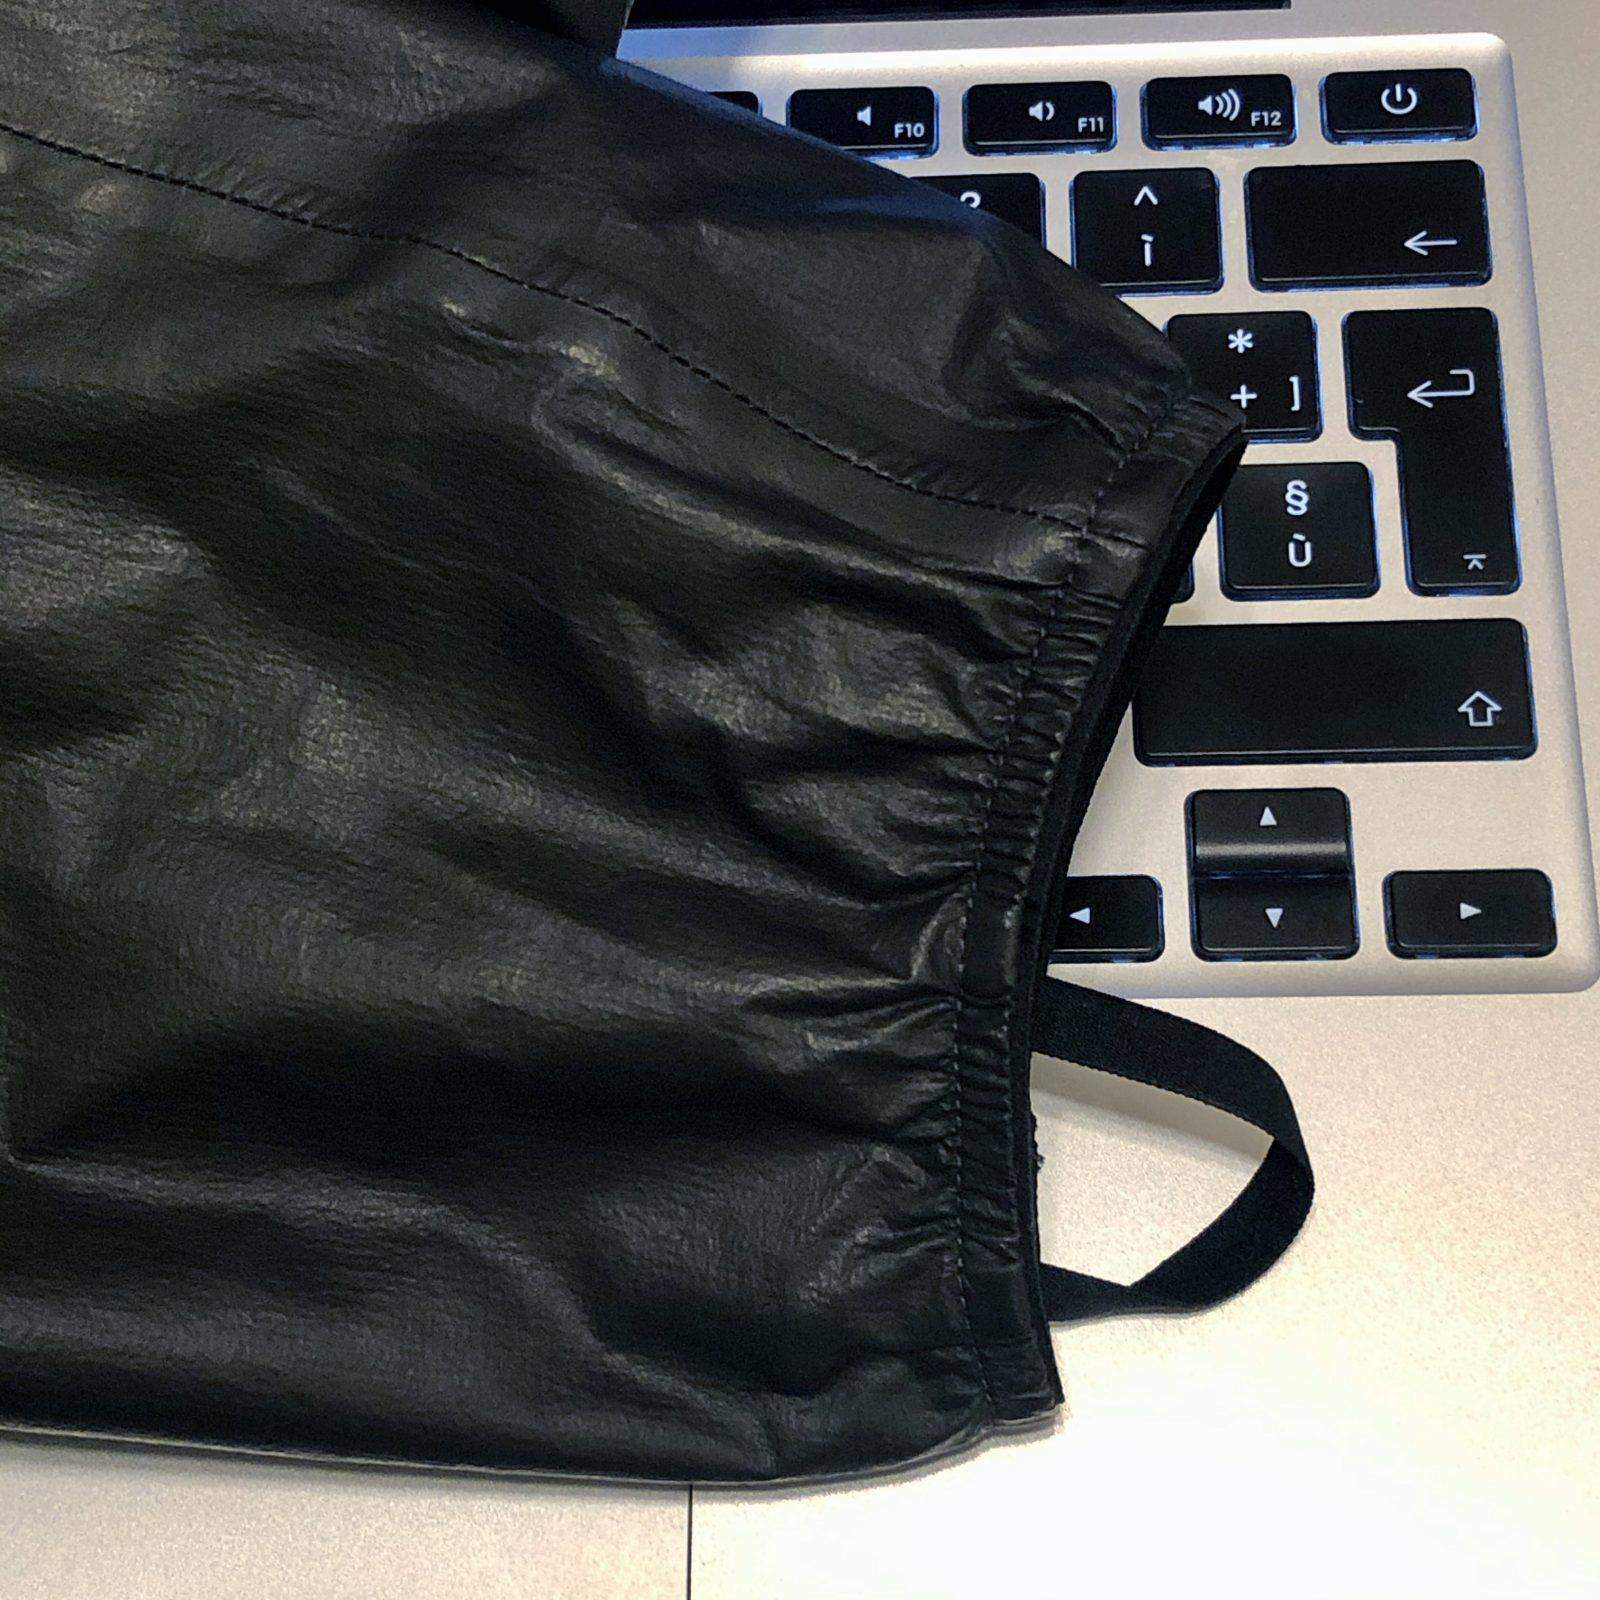 Montura giacca Flyaway: polsino elastico e anello per pollice